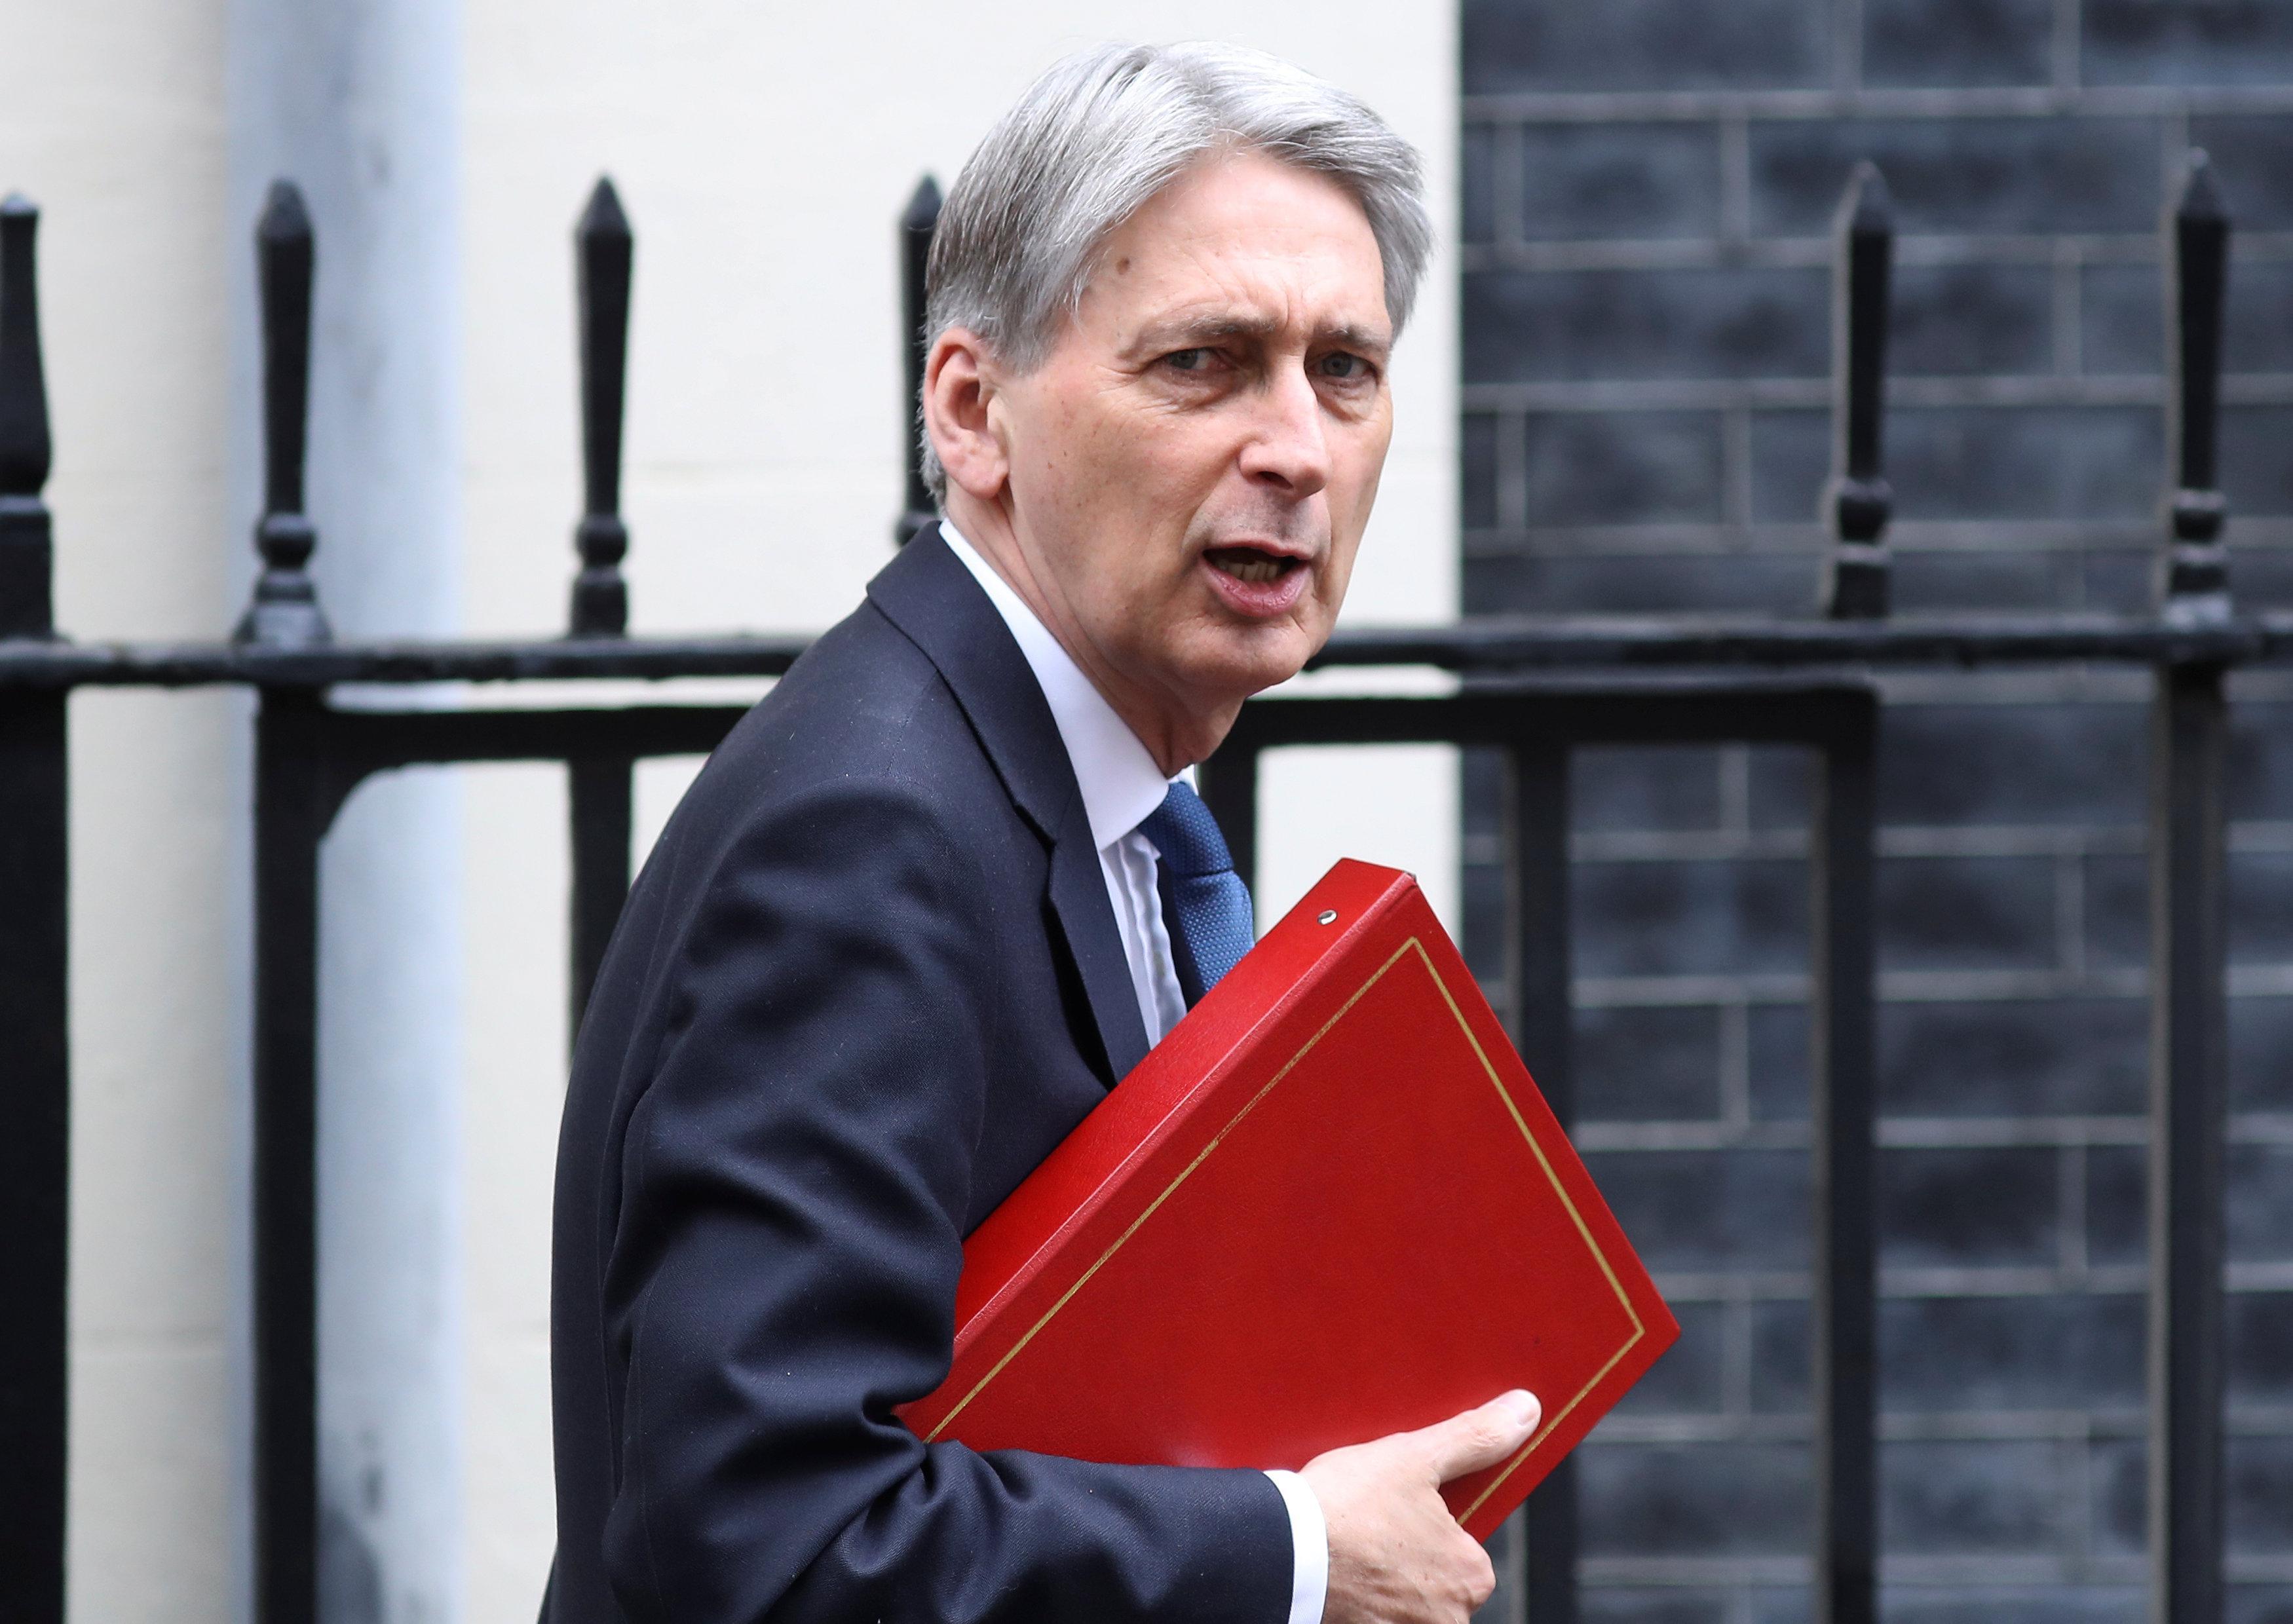 Hammond Inggris - kesepakatan perdagangan dengan UE hanya akan terjadi jika adil